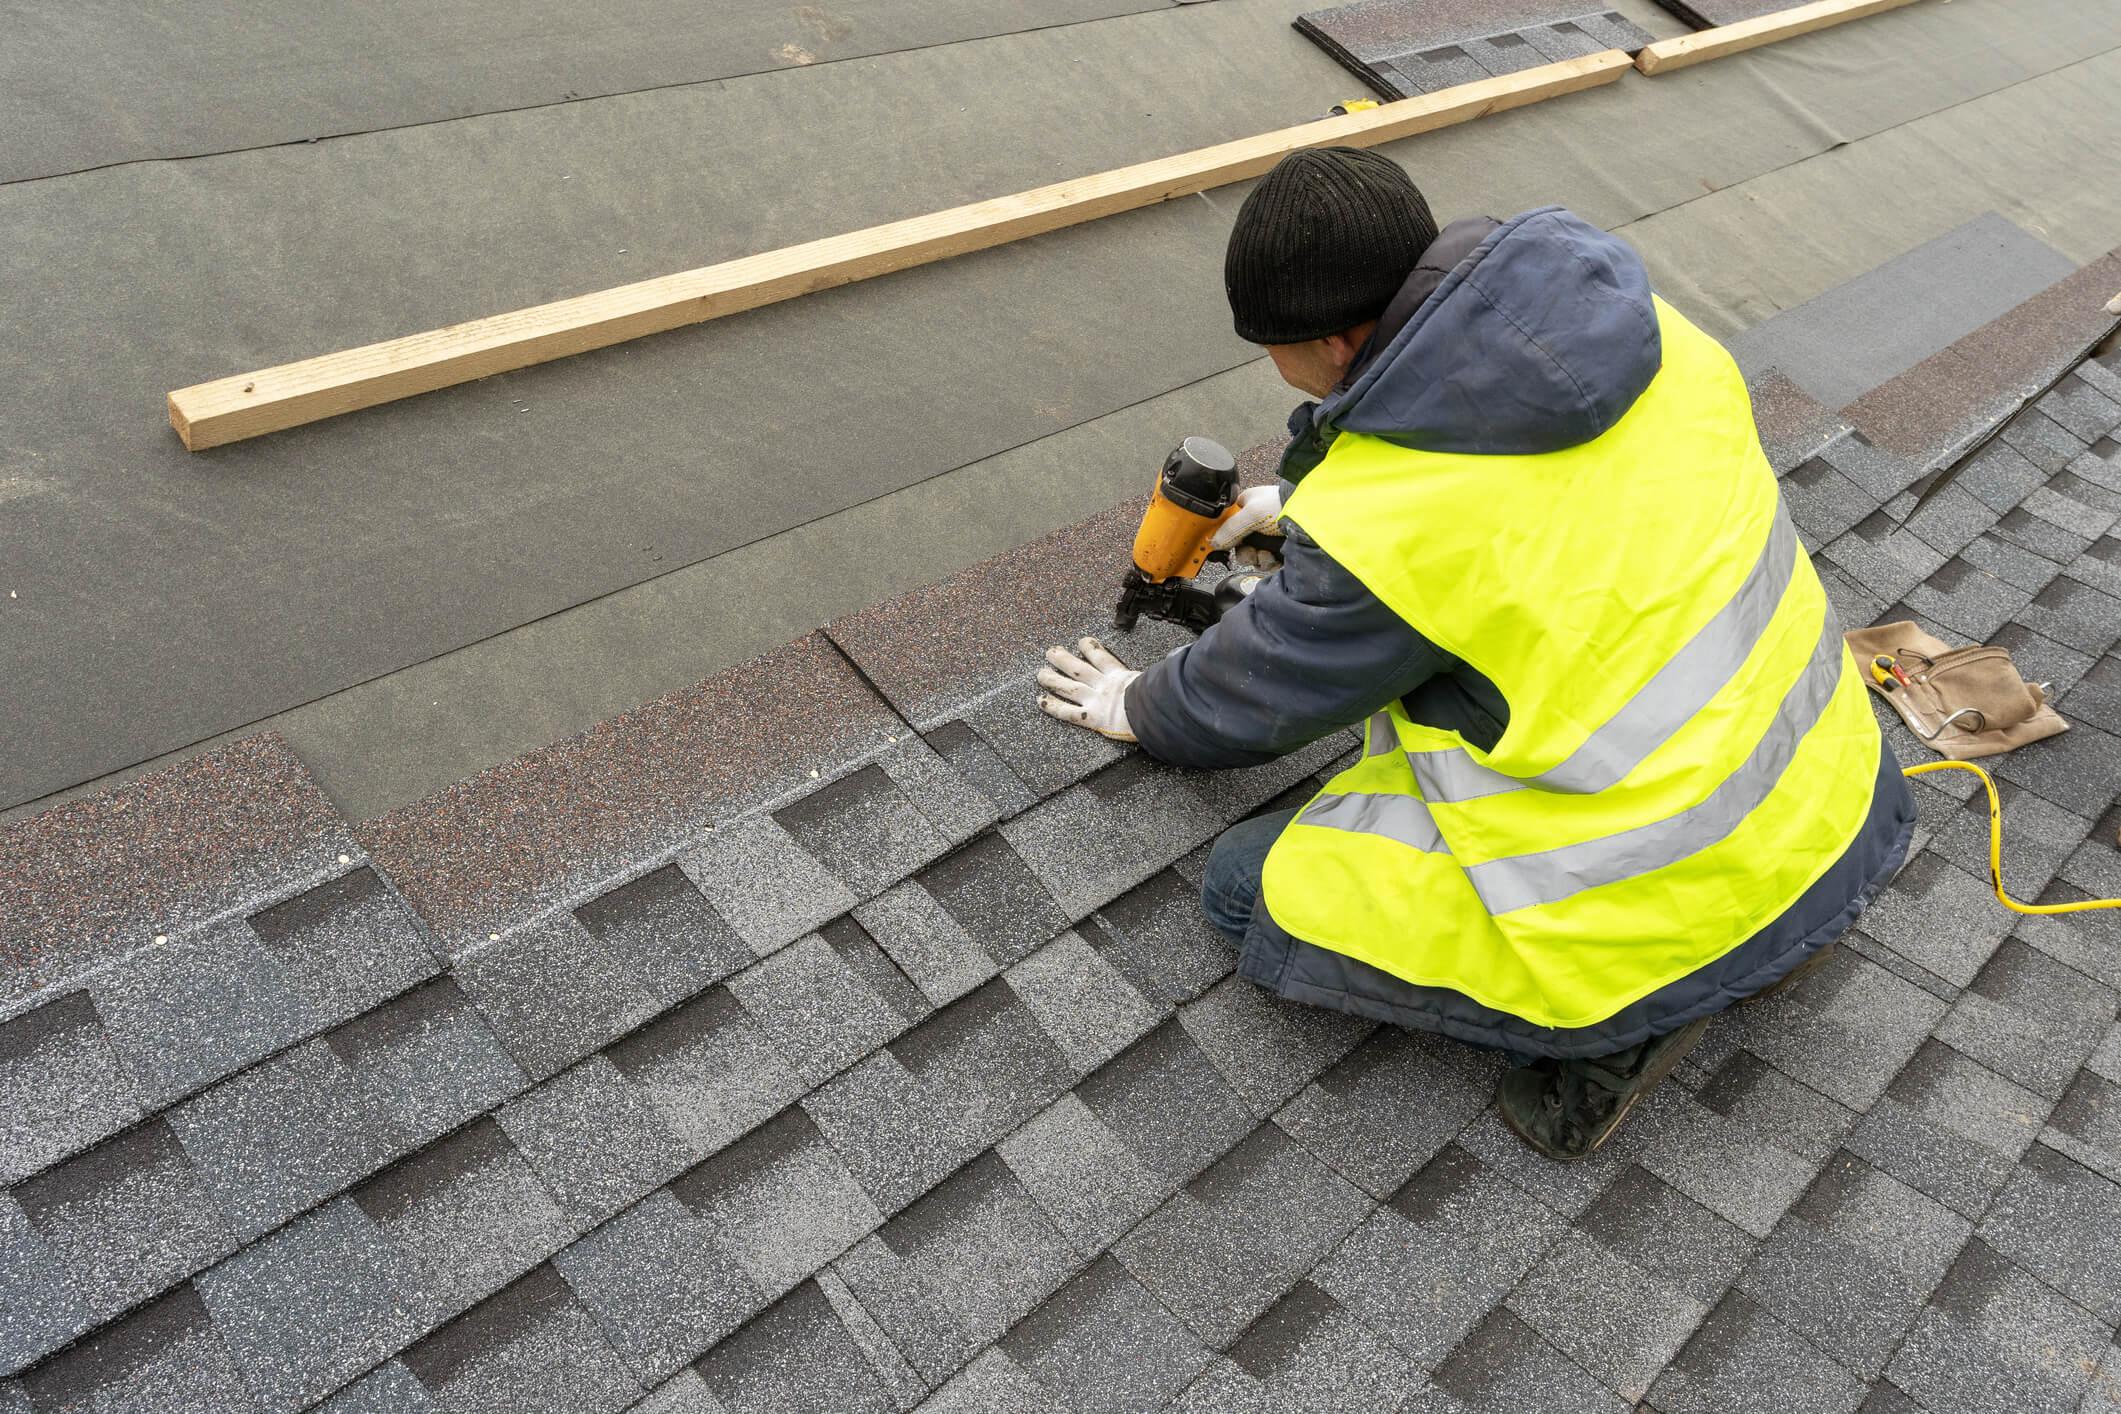 roof repairman installing shingle